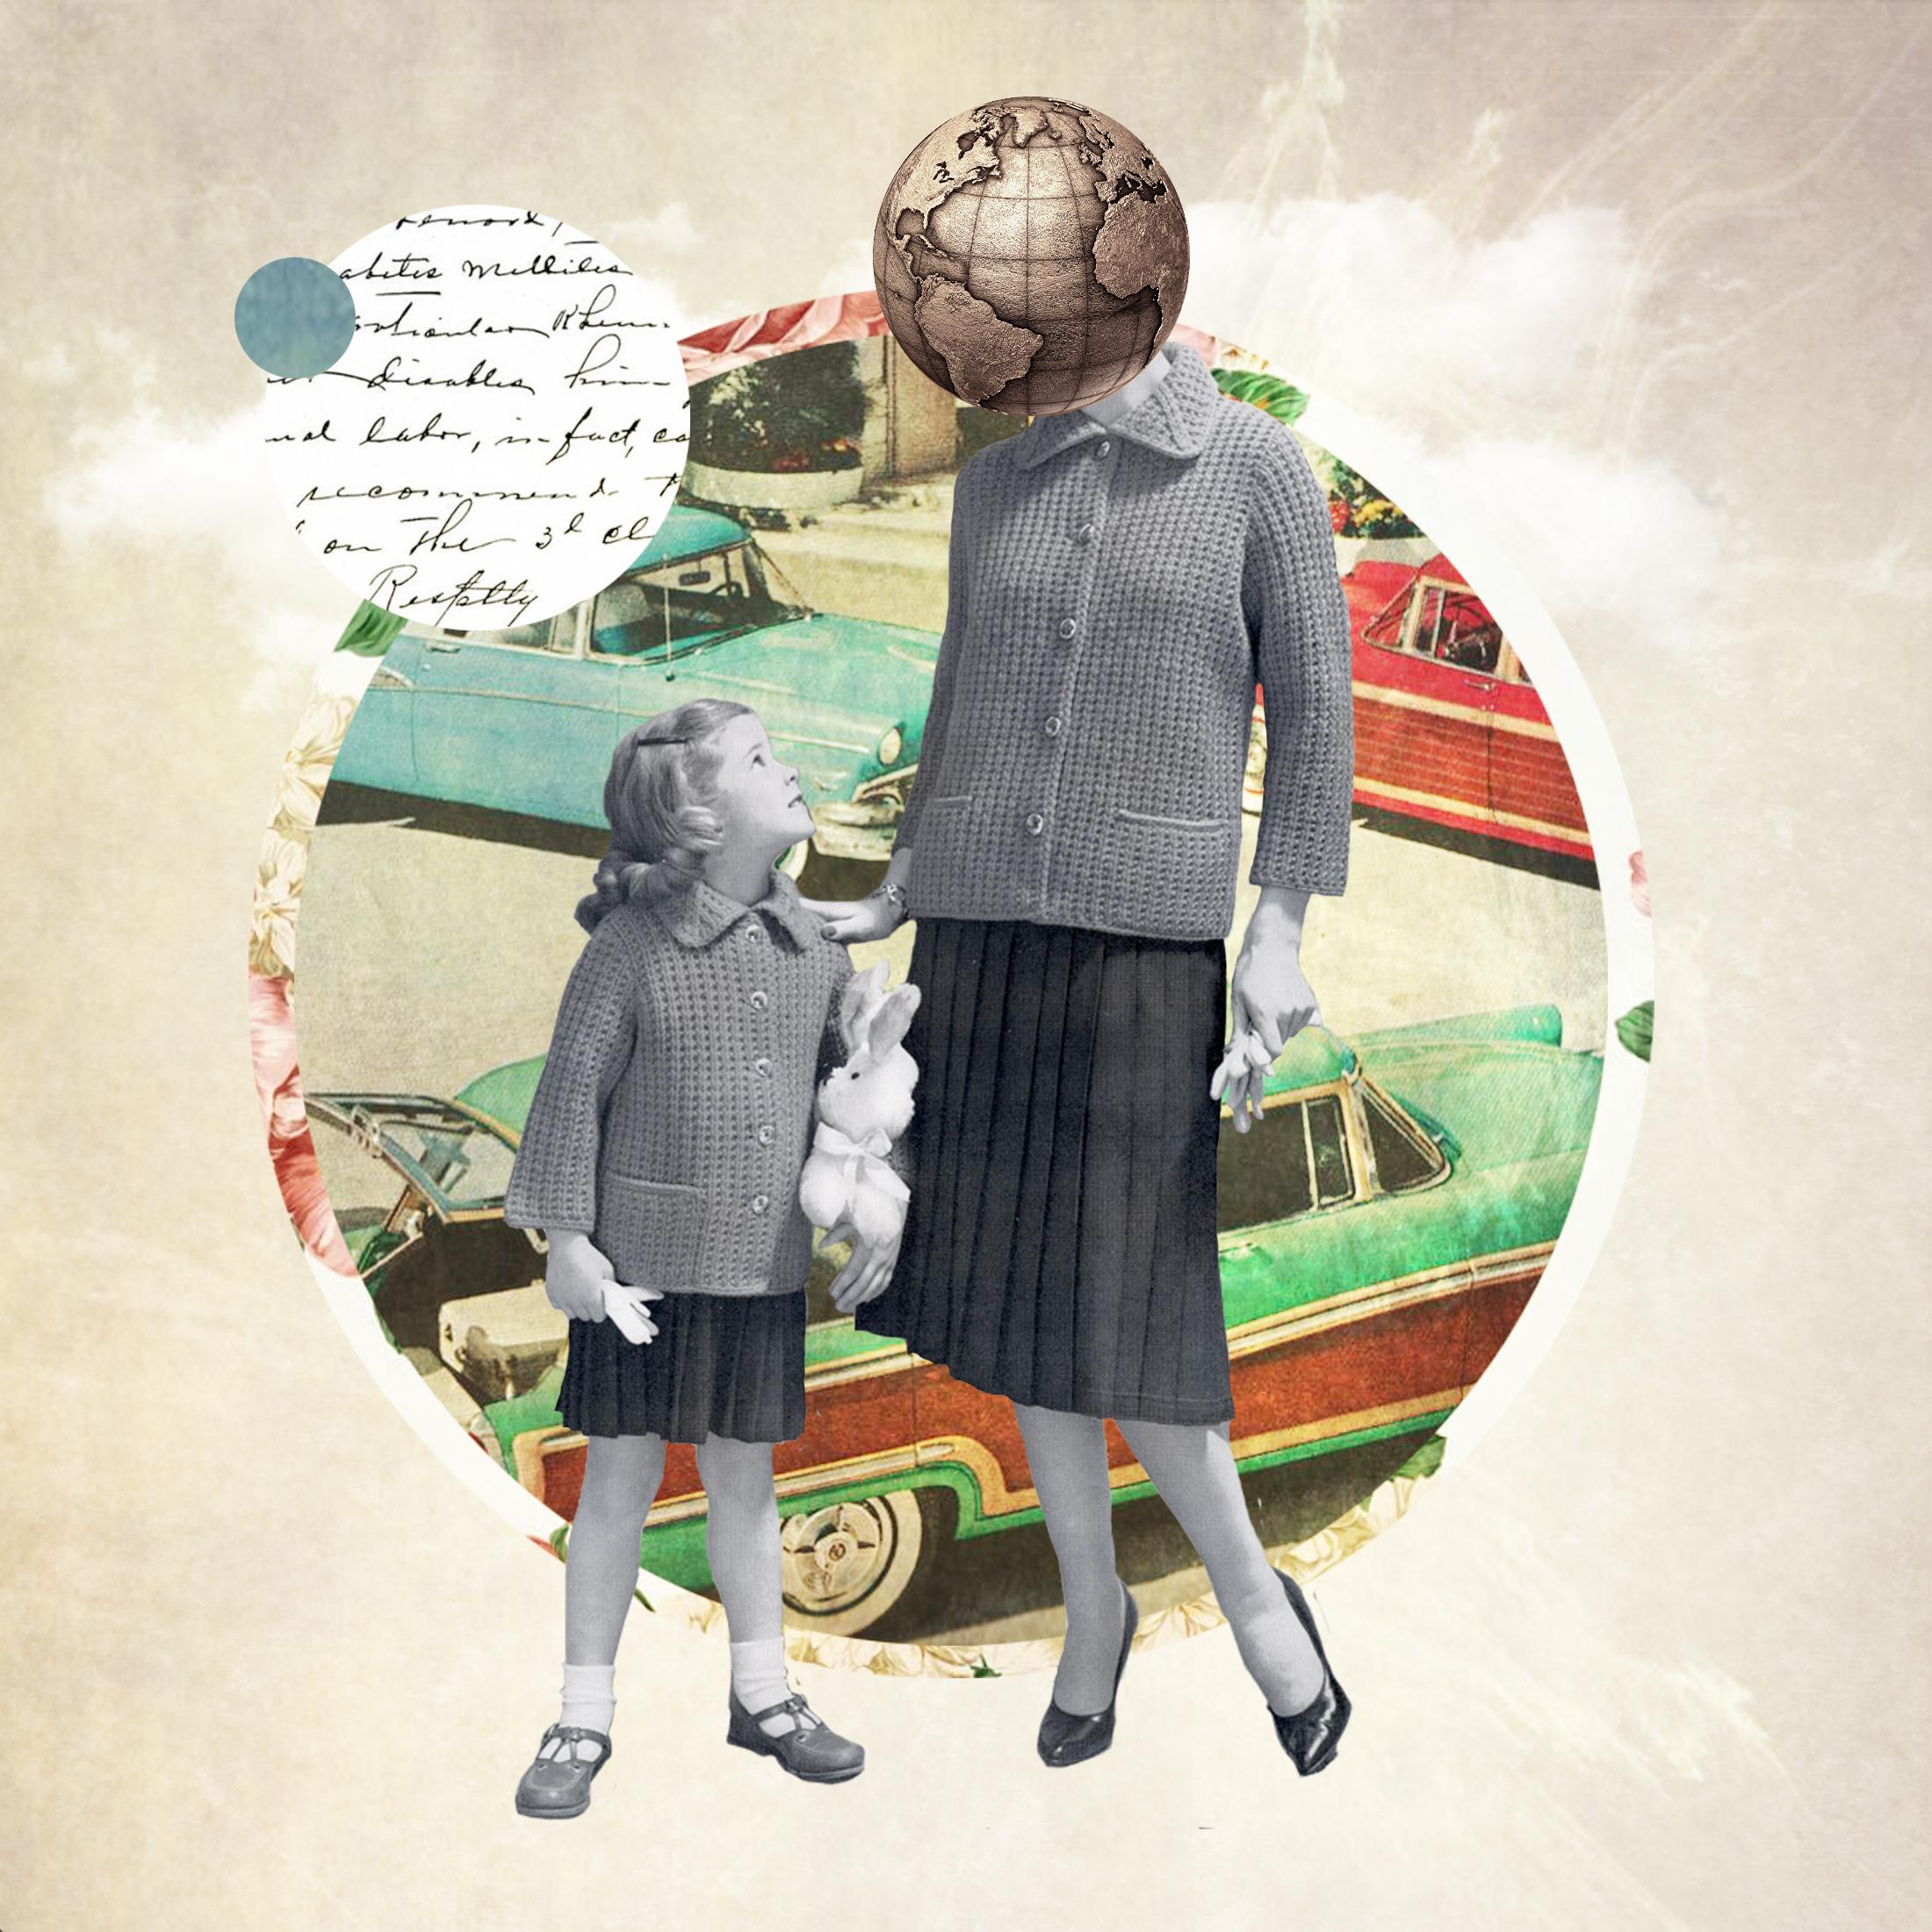 Jenkins, Cheyenne.  Wisdom. 2015. Digital Collage. Montreal, Quebec